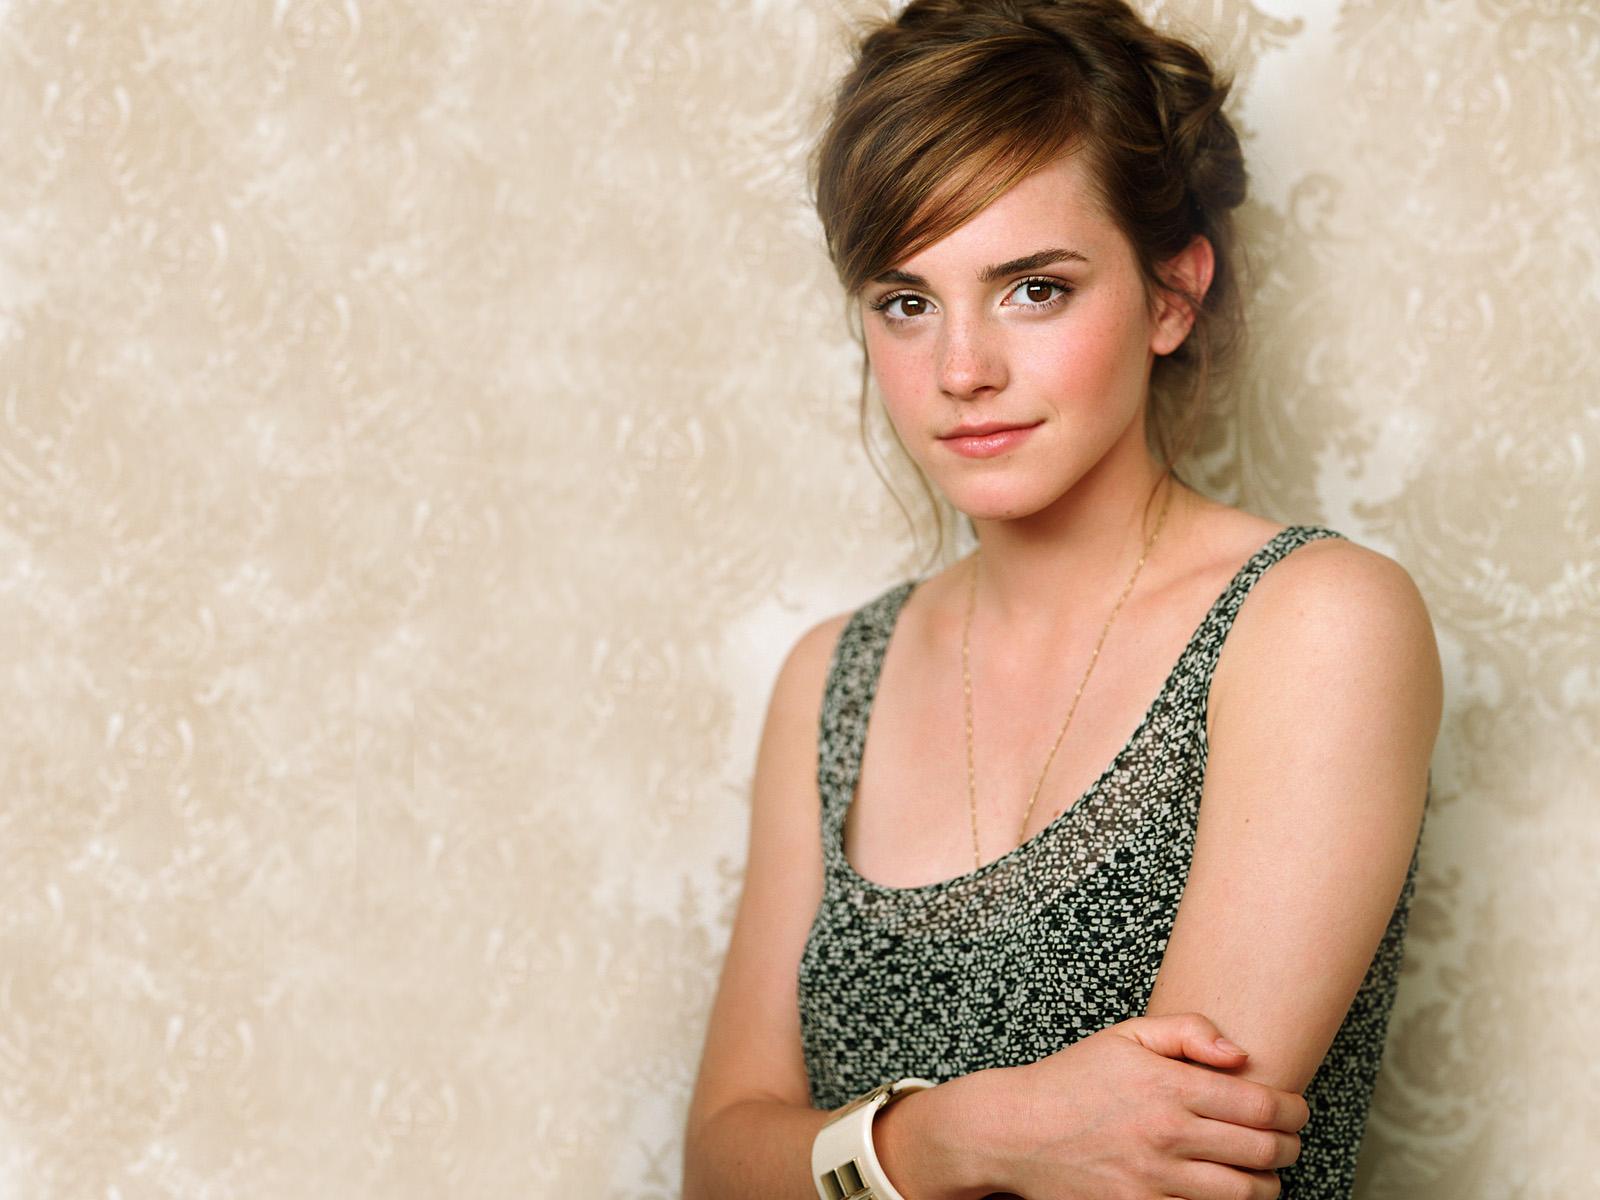 http://1.bp.blogspot.com/-reJPFZpgcH0/T2YM7OwhodI/AAAAAAAAEc8/Tf3oJJLGuFs/s1600/Emma-Watson-Wallpapers-Latest-4.jpg